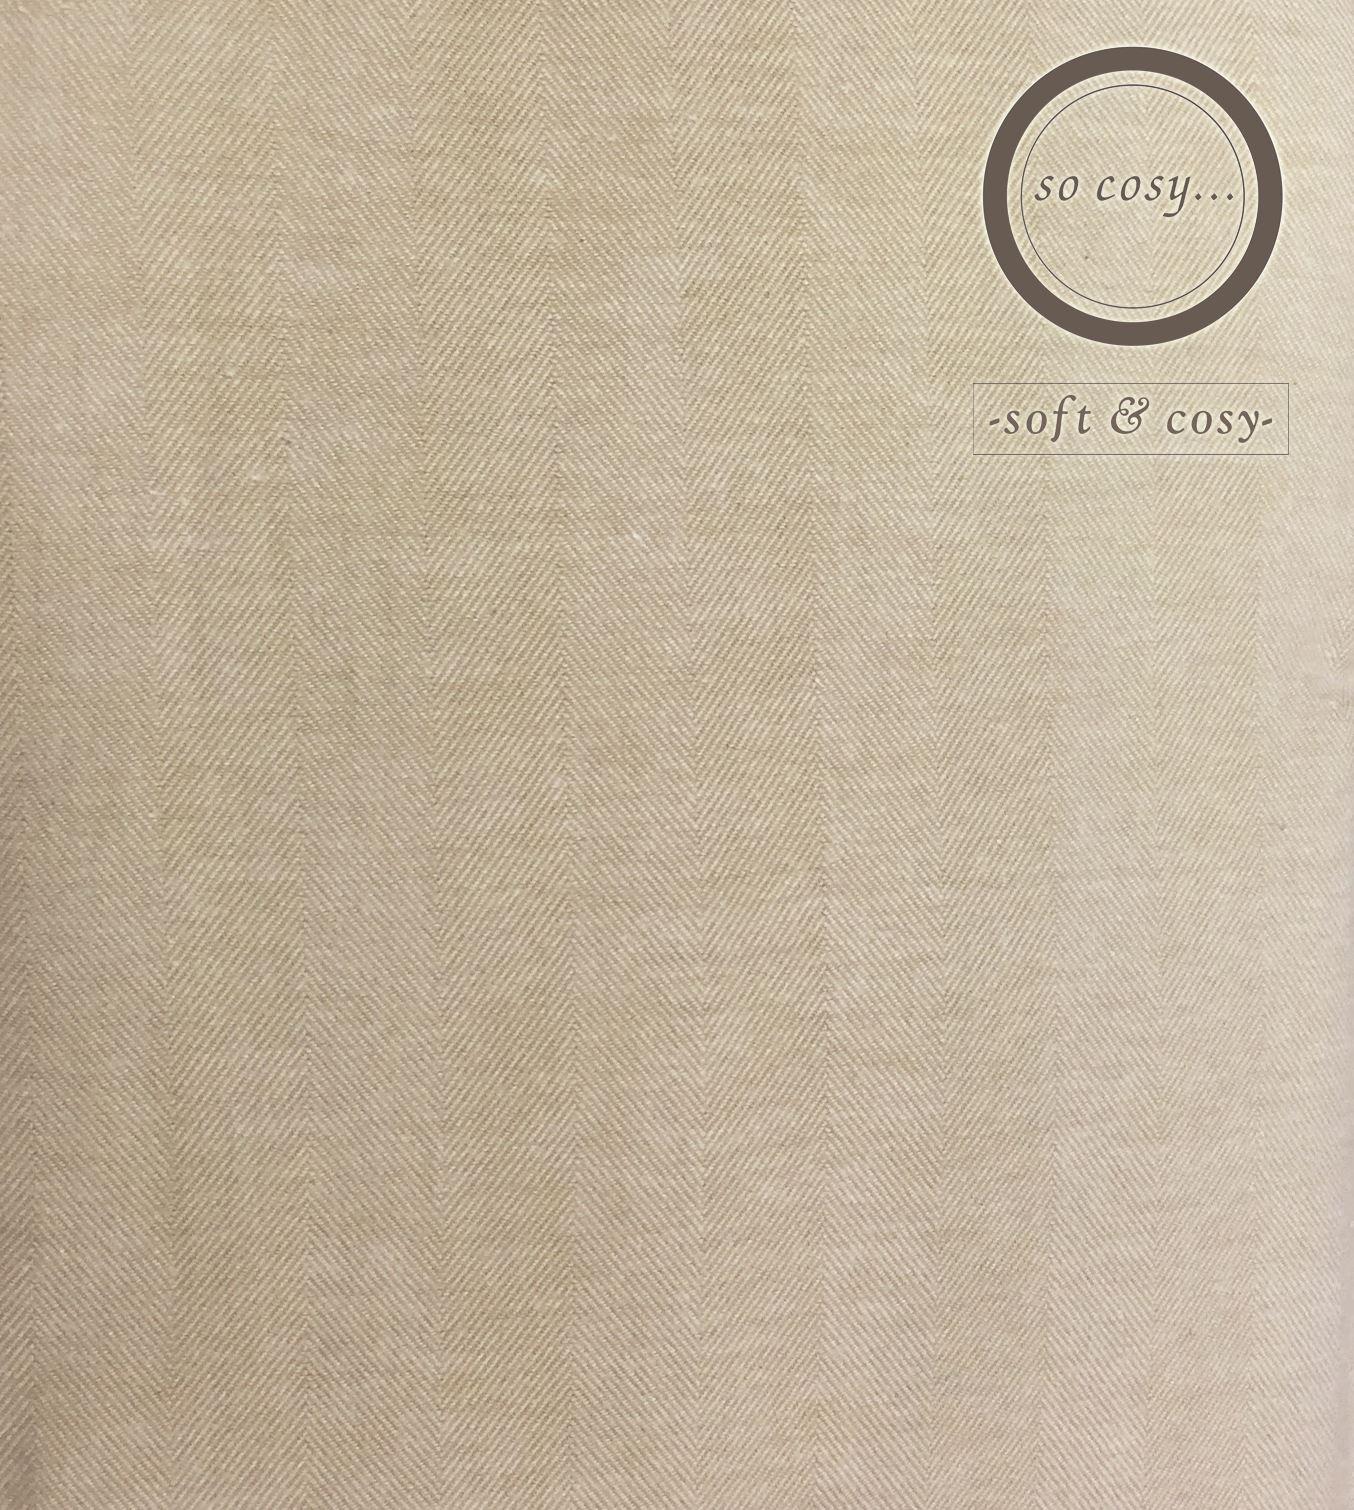 Herringbone-Woven-100-Cotton-Flannel-Duvet-Cover-Bedding-Set-Single-Double-King thumbnail 9